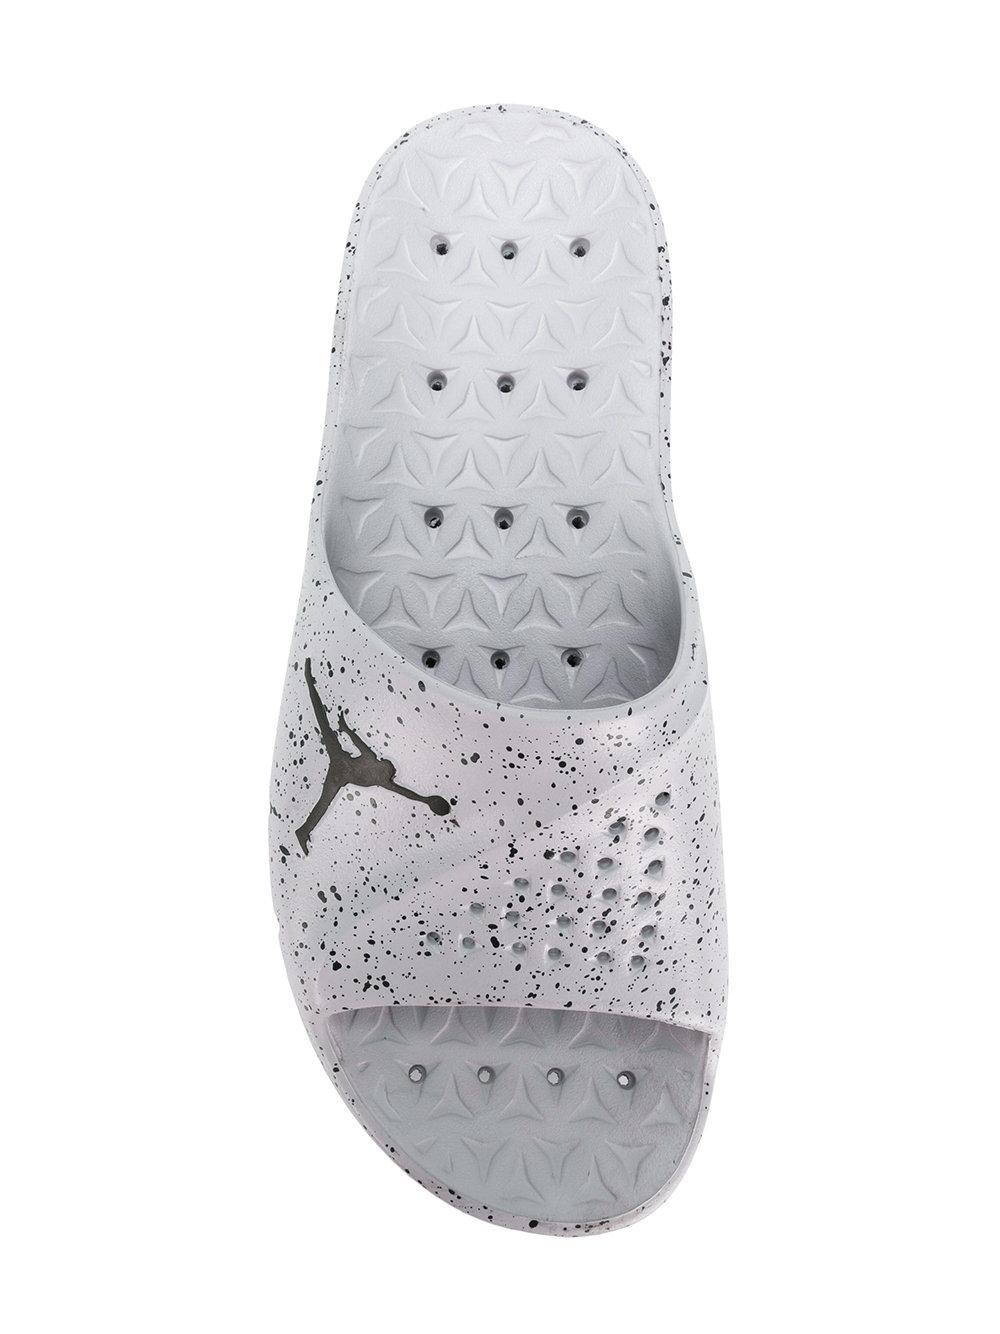 Nike Jordan Superfly Slides in Gray for Men - Lyst ad0a72e8f38